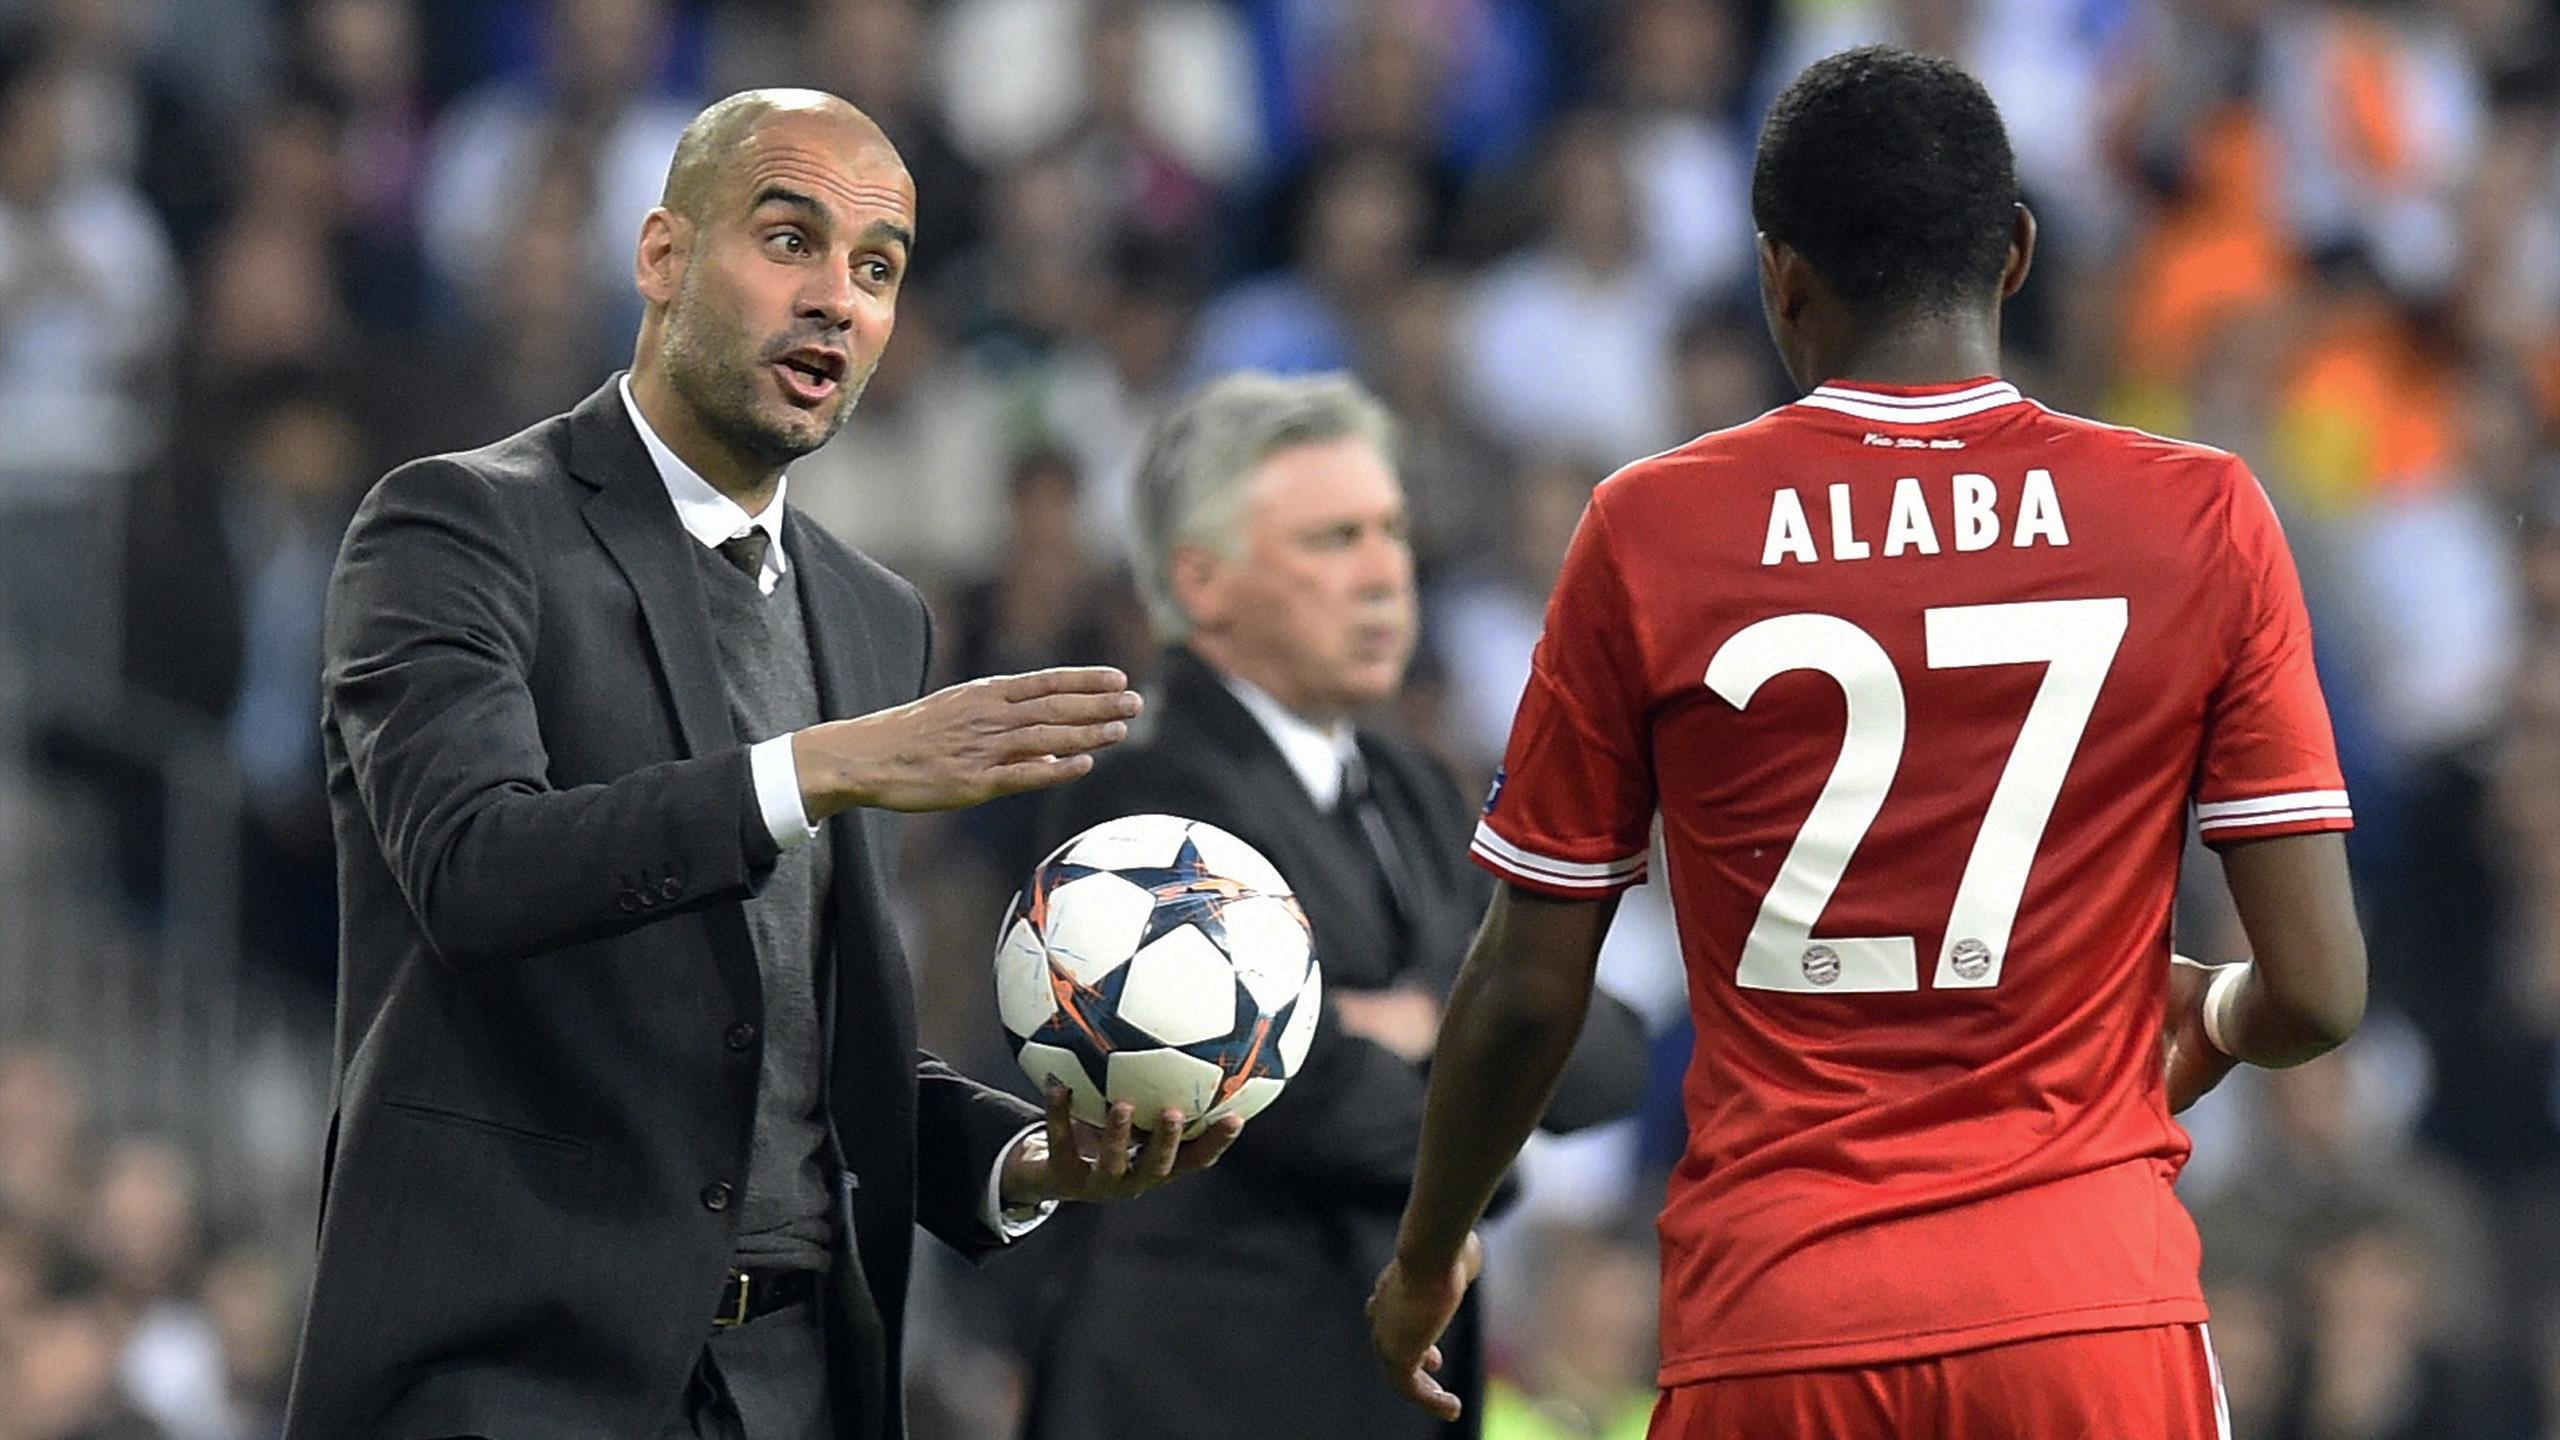 Bayern Munich's Spanish head coach Pep Guardiola (L) gives instructions to Bayern Munich's Austrian midfielder David Alaba